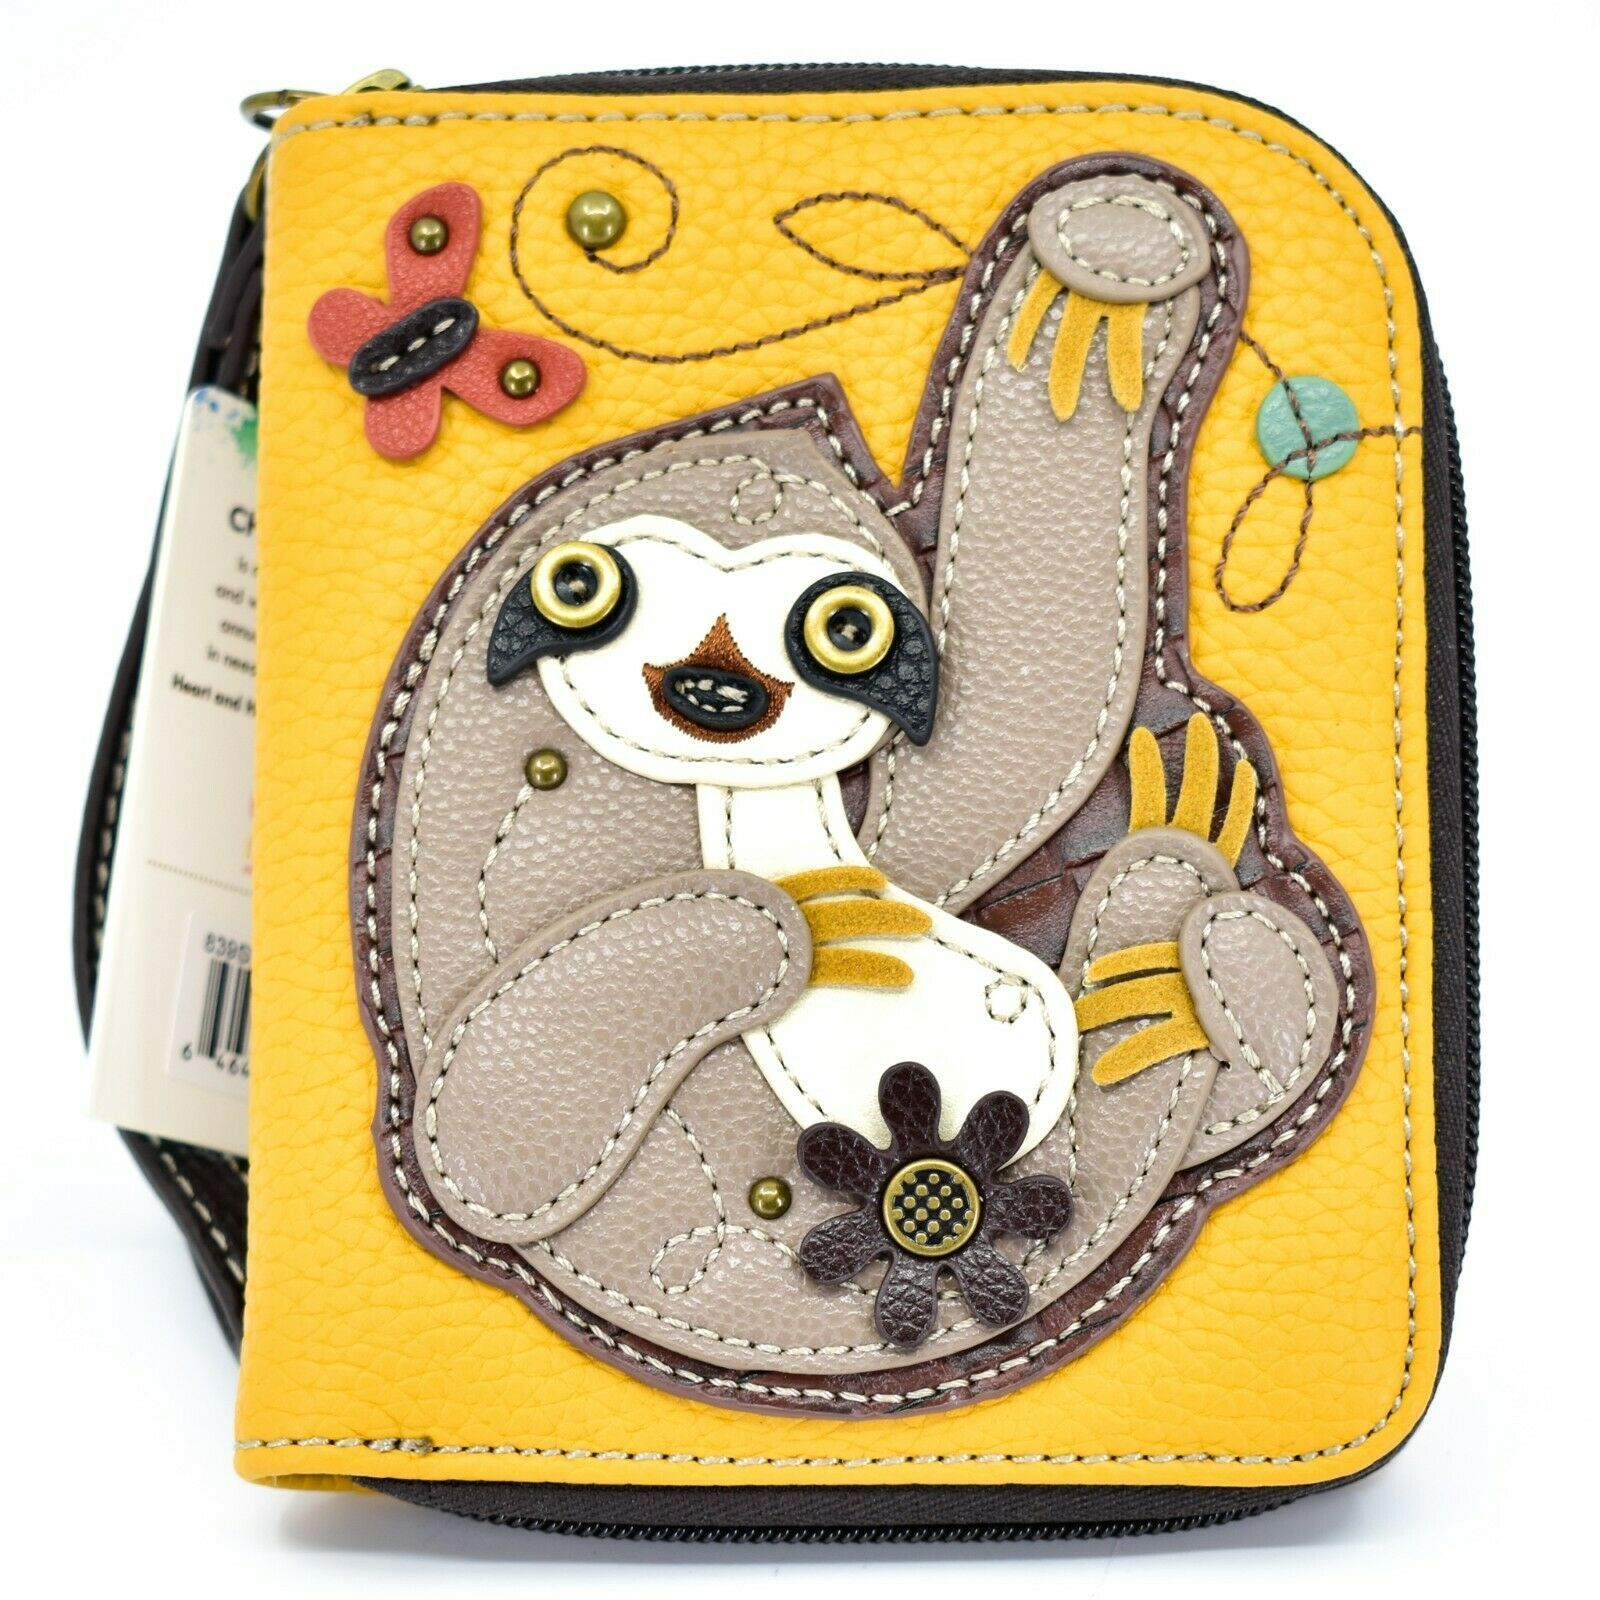 Chala Handbags Faux Leather Whimsical Sloth Mustard Zip Around Wristlet Wallet